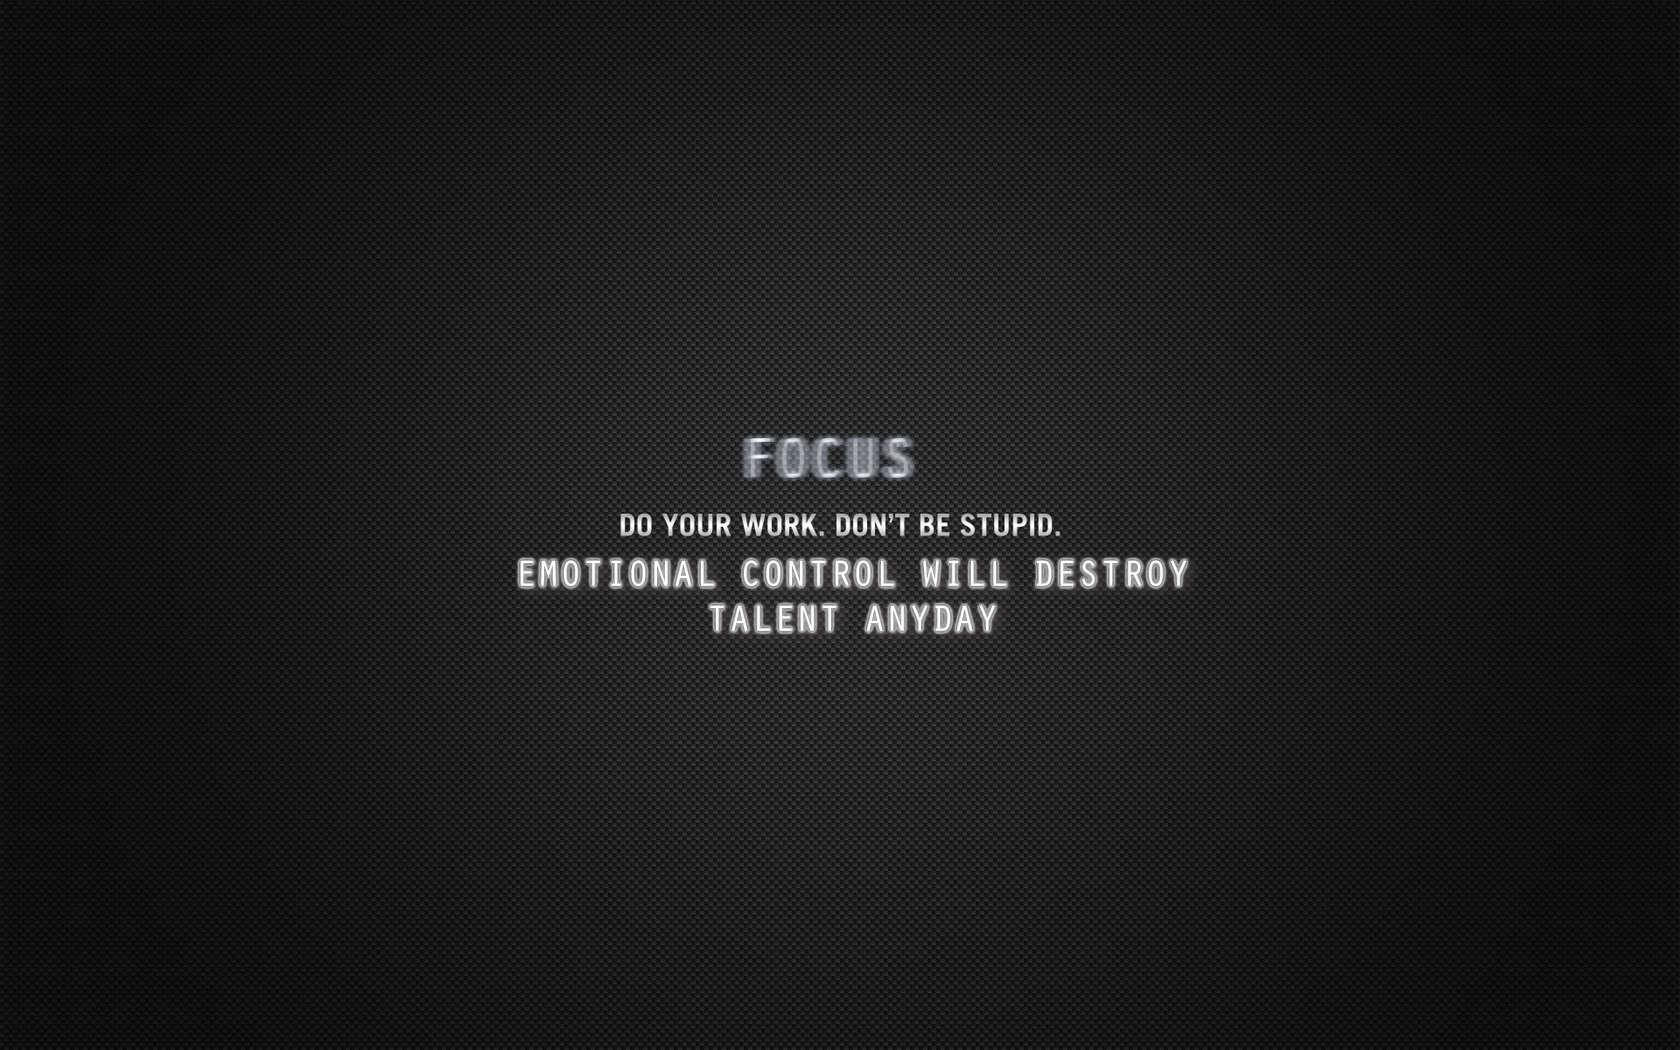 Fitness Motivation Quotes For Desktop Background Quotesgram